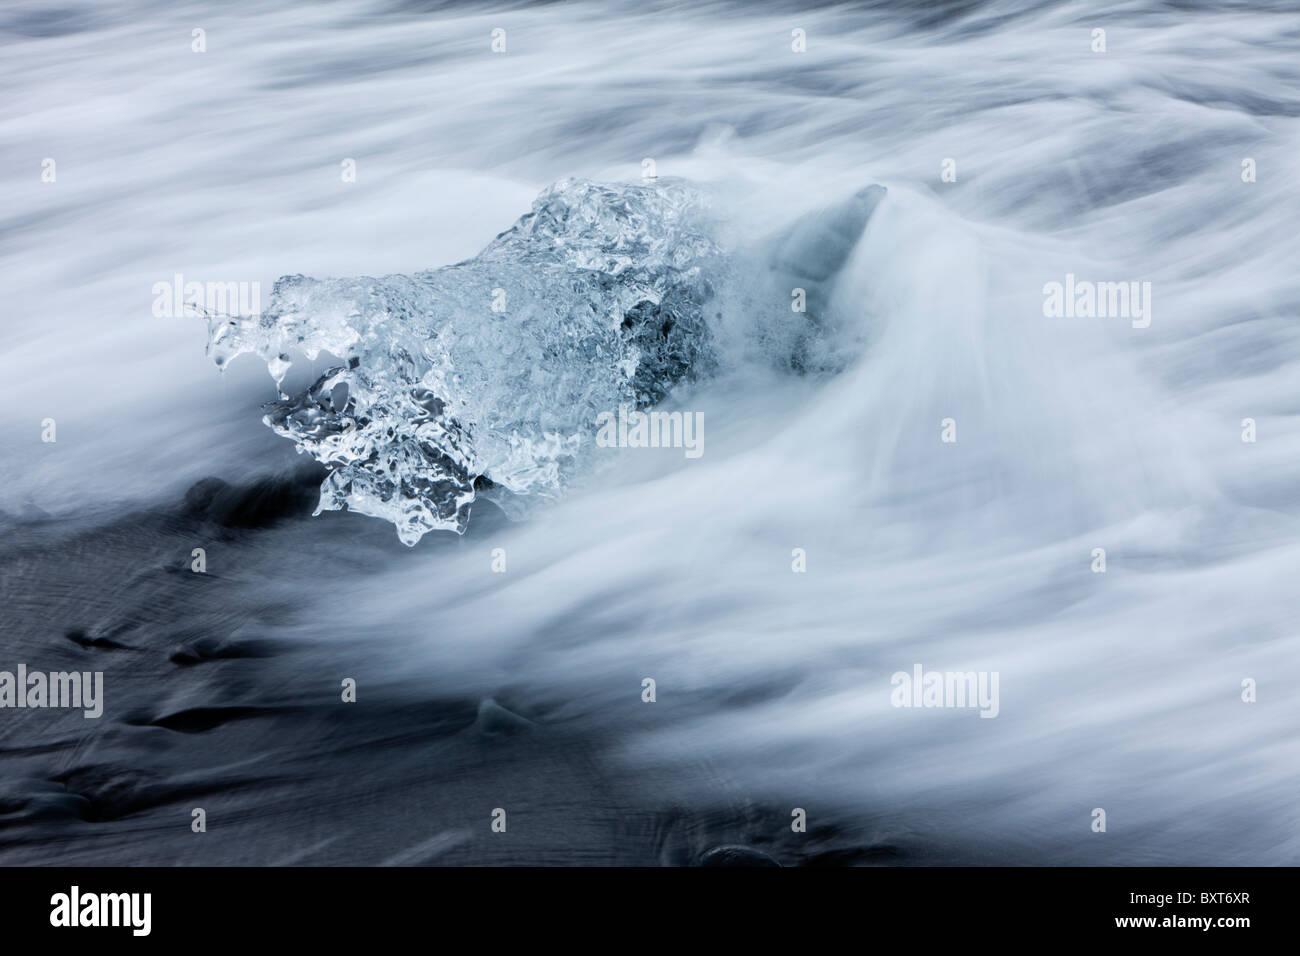 Iceland Skaftafell National Park Motion blur image of icebergs from Vatnajokull Glacier in waves from North Atlantic - Stock Image